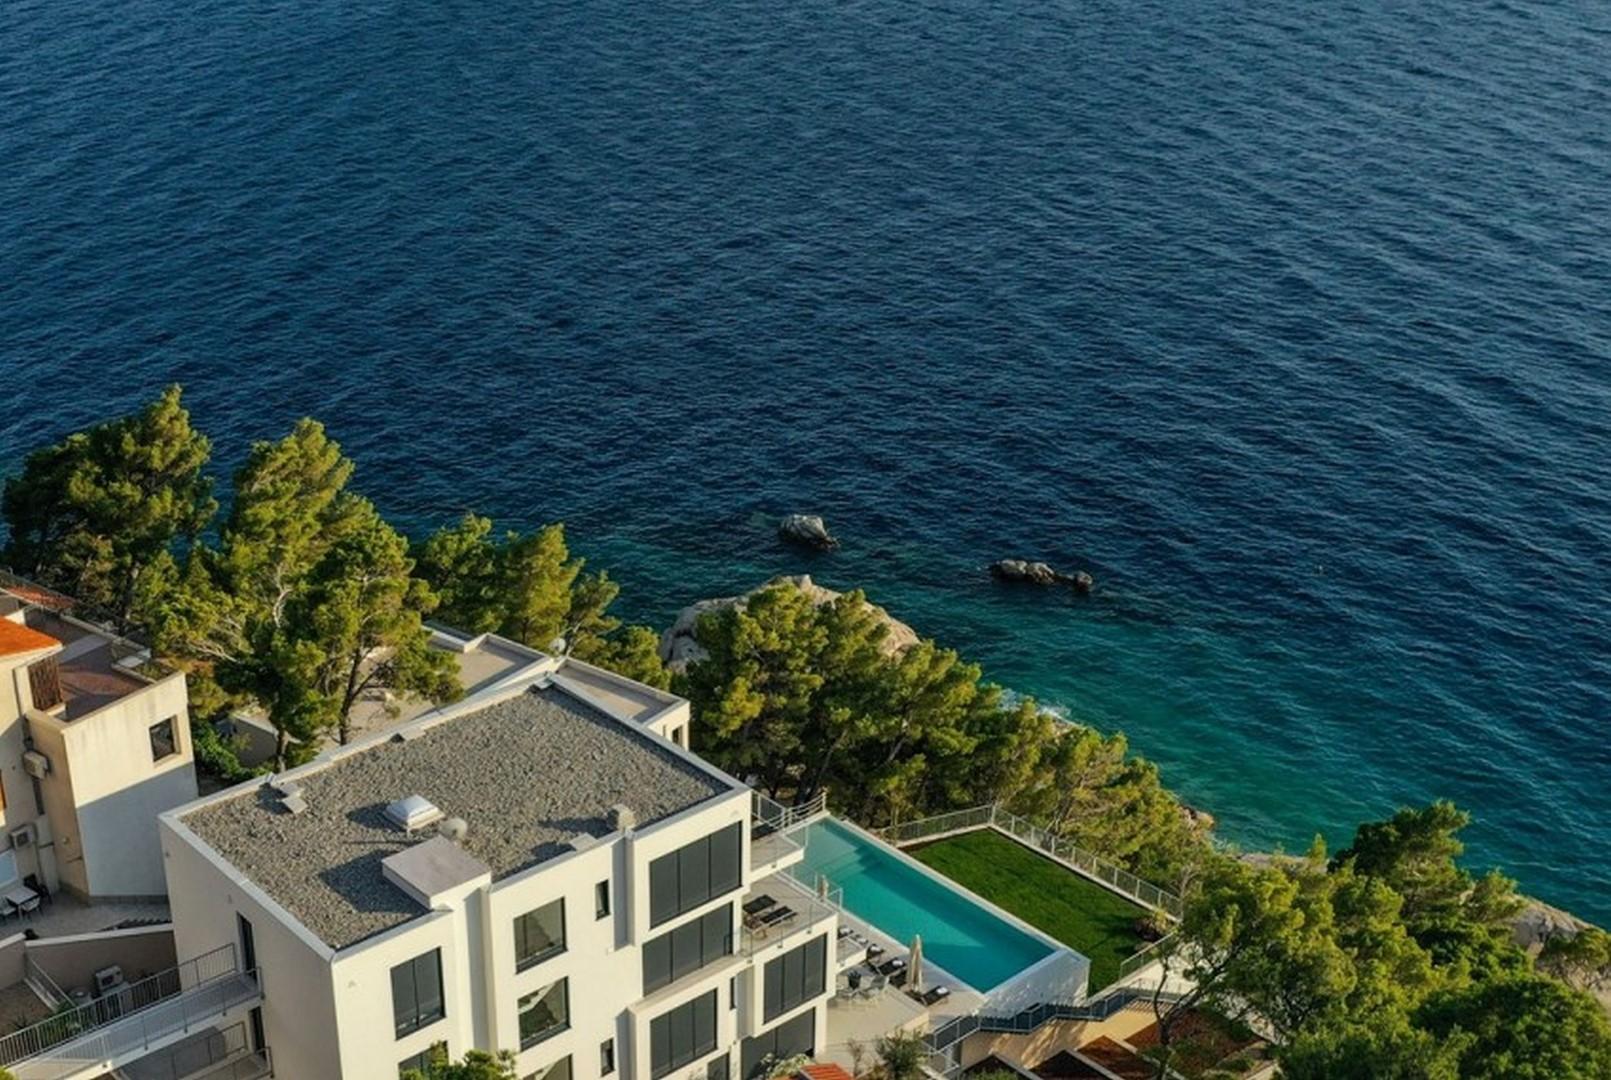 Alternativer Eigenschaftsname  Luxusvilla Glorious  in Kroatien